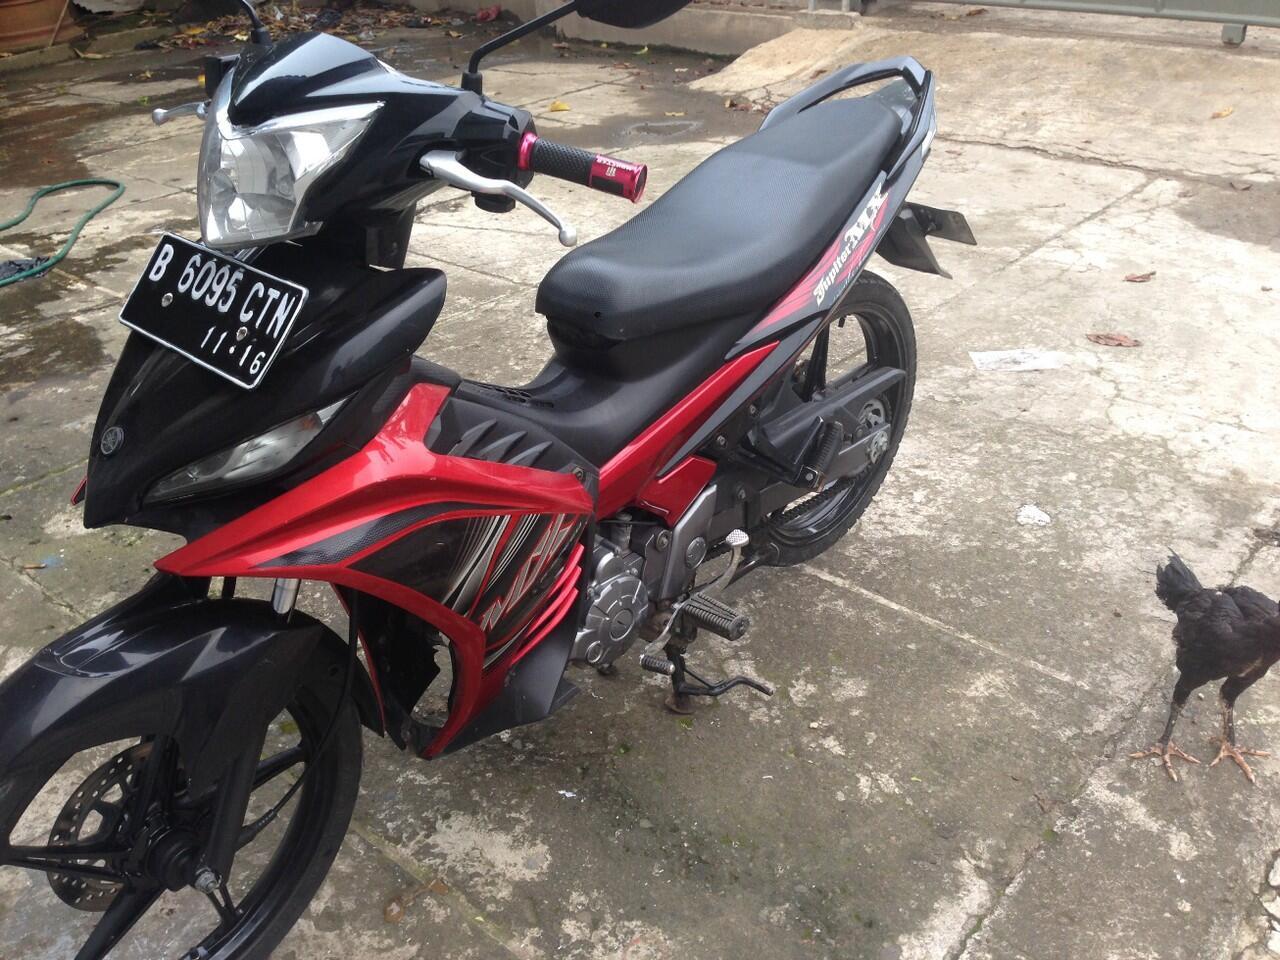 Yamaha New Jupiter Mx 2012 Merah Mulus Murah